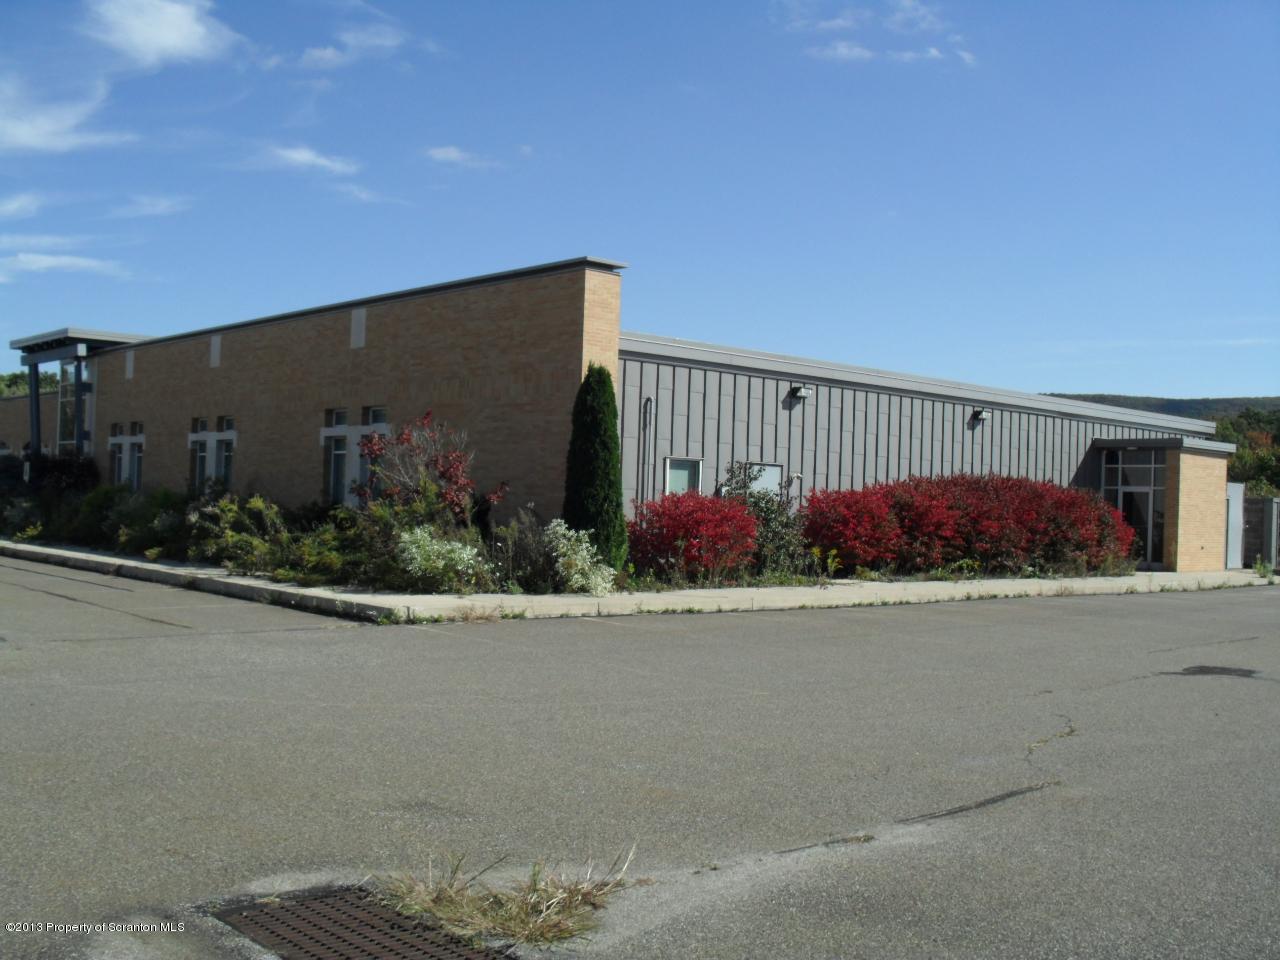 10 FOX RUN RD, Drums, Pennsylvania 18222, ,4 BathroomsBathrooms,Commercial,For Sale,FOX RUN,13-27